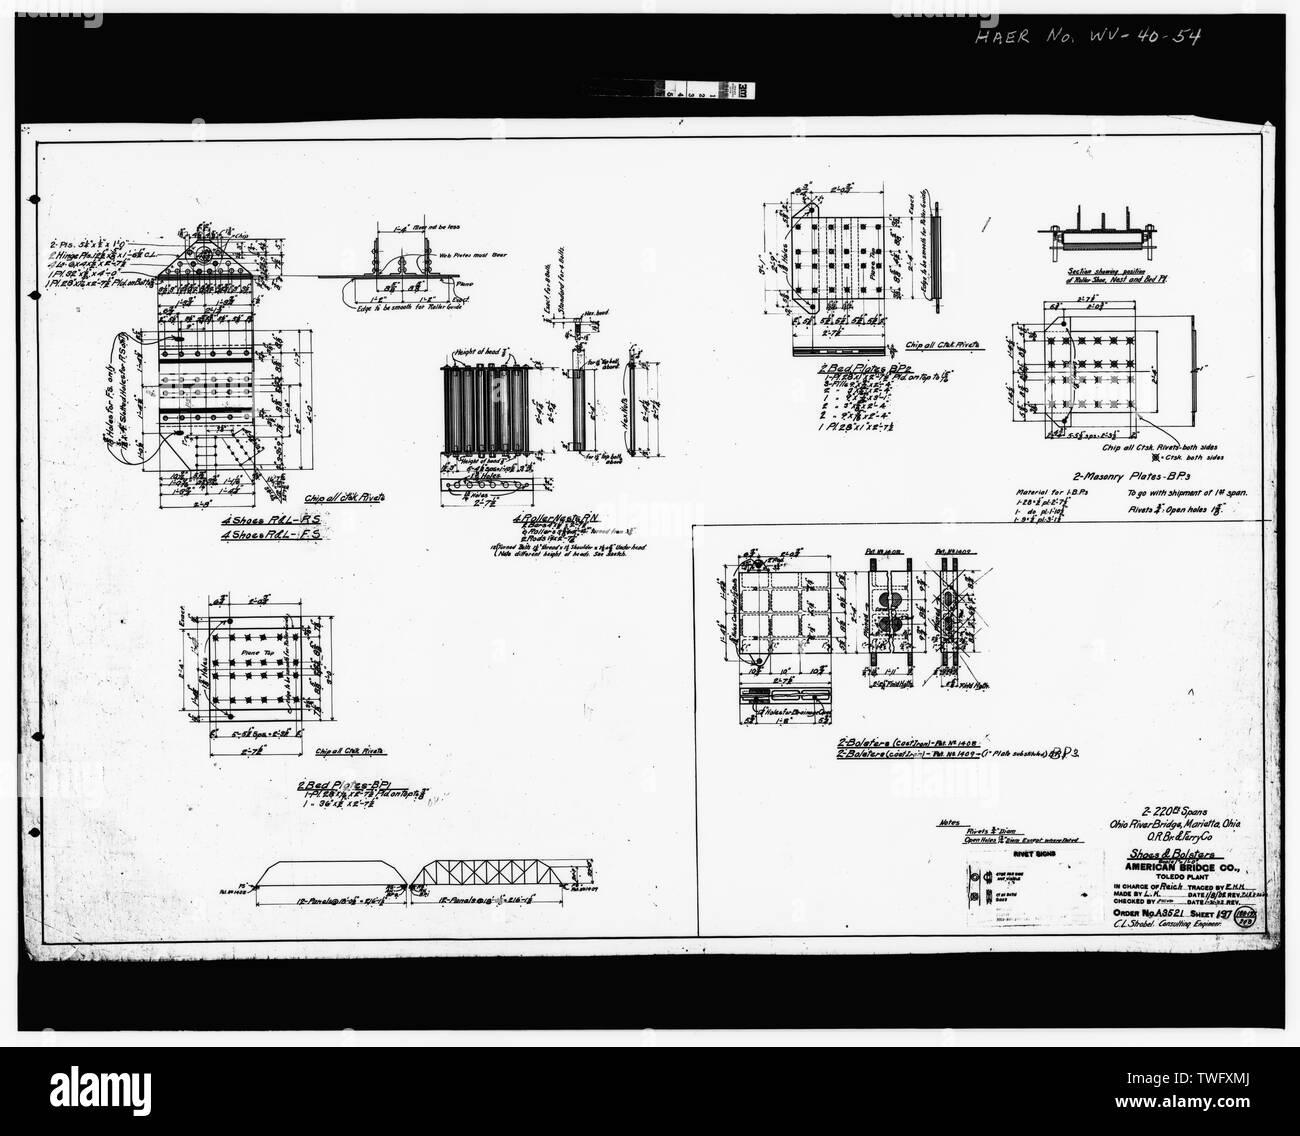 Plan Sheet -197 - Williamstown-Marietta Bridge, Spanning Ohio River between Williamstown and Marietta, Williamstown, Wood County, WV; American Bridge Company; Strobel, Charles L; Ripley, T M - Stock Image